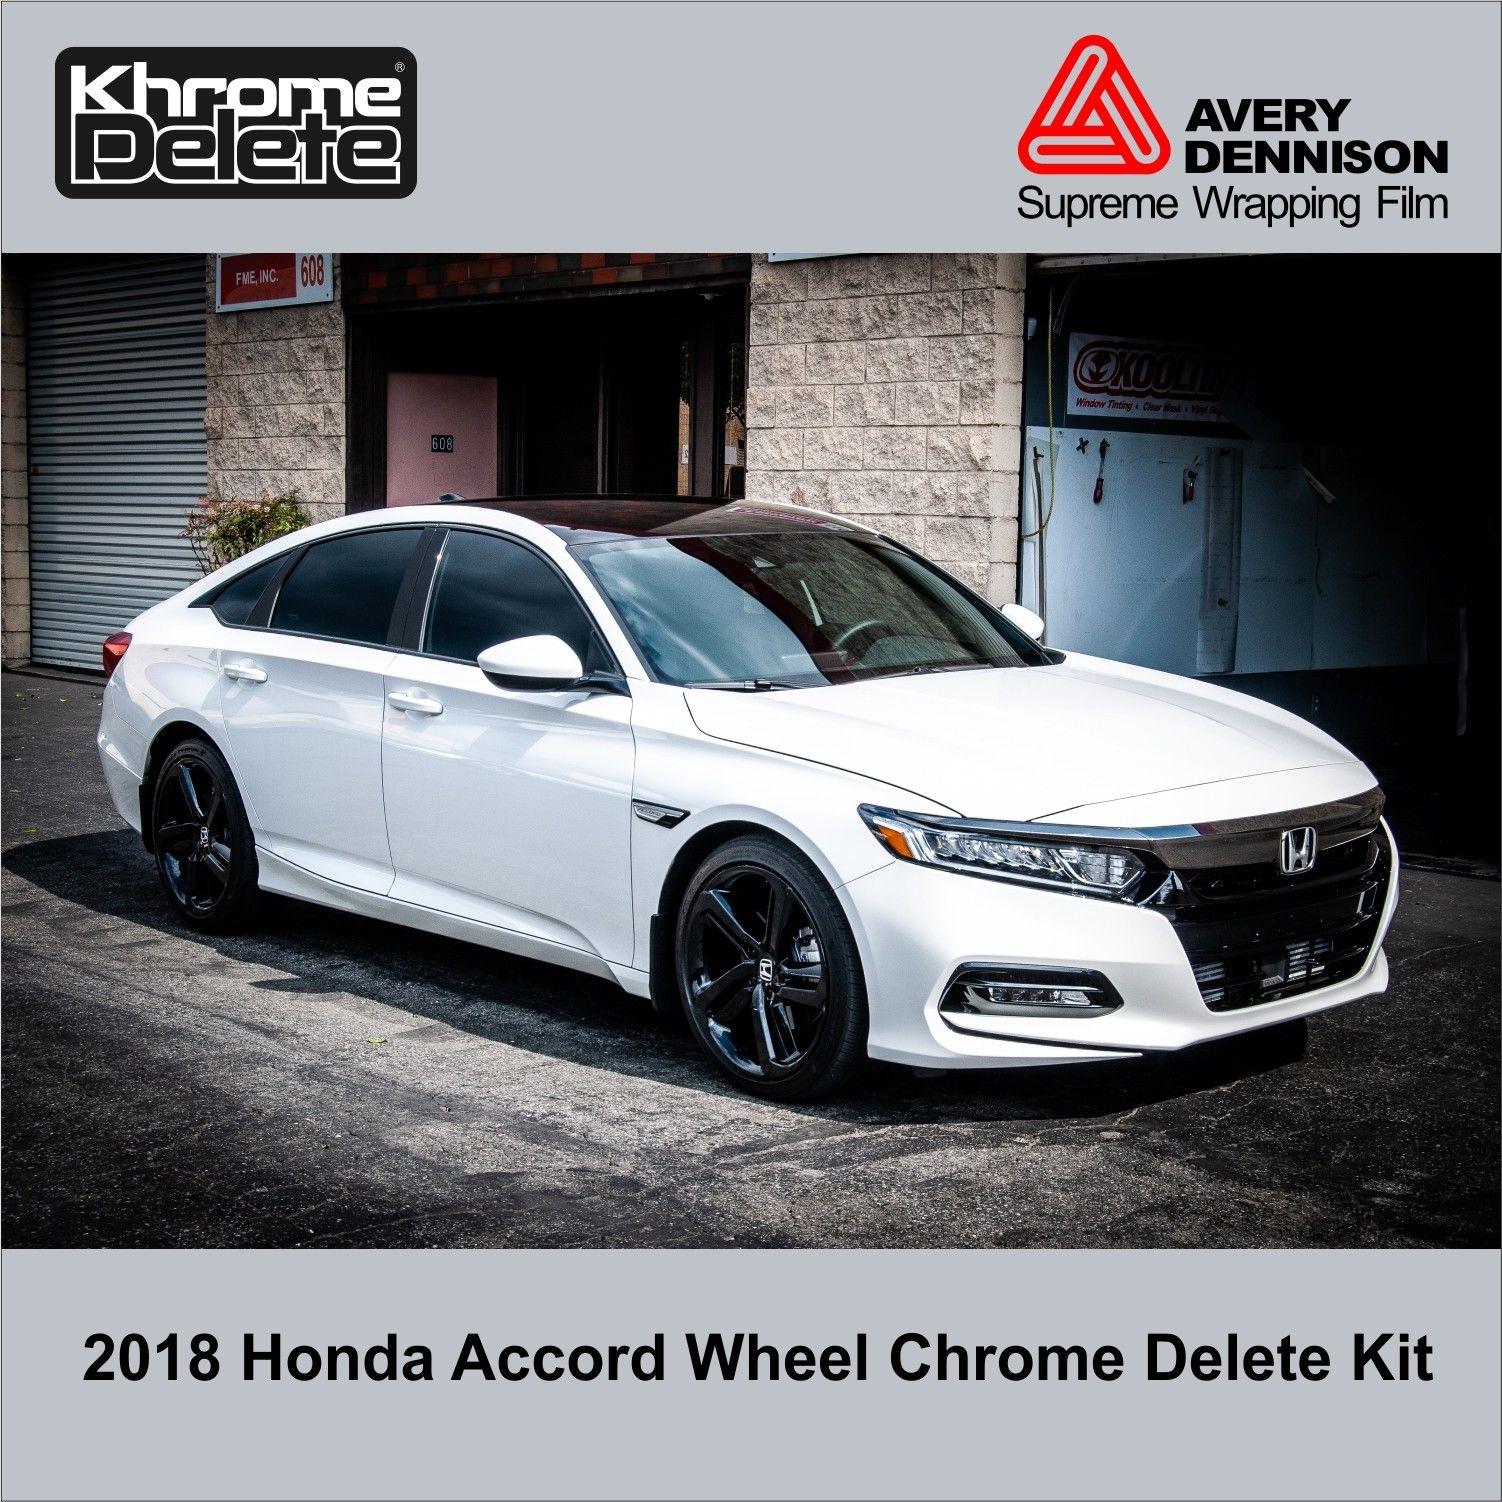 2018 Honda Accord Sedan Sport Wheel Chrome Delete Kit 2019